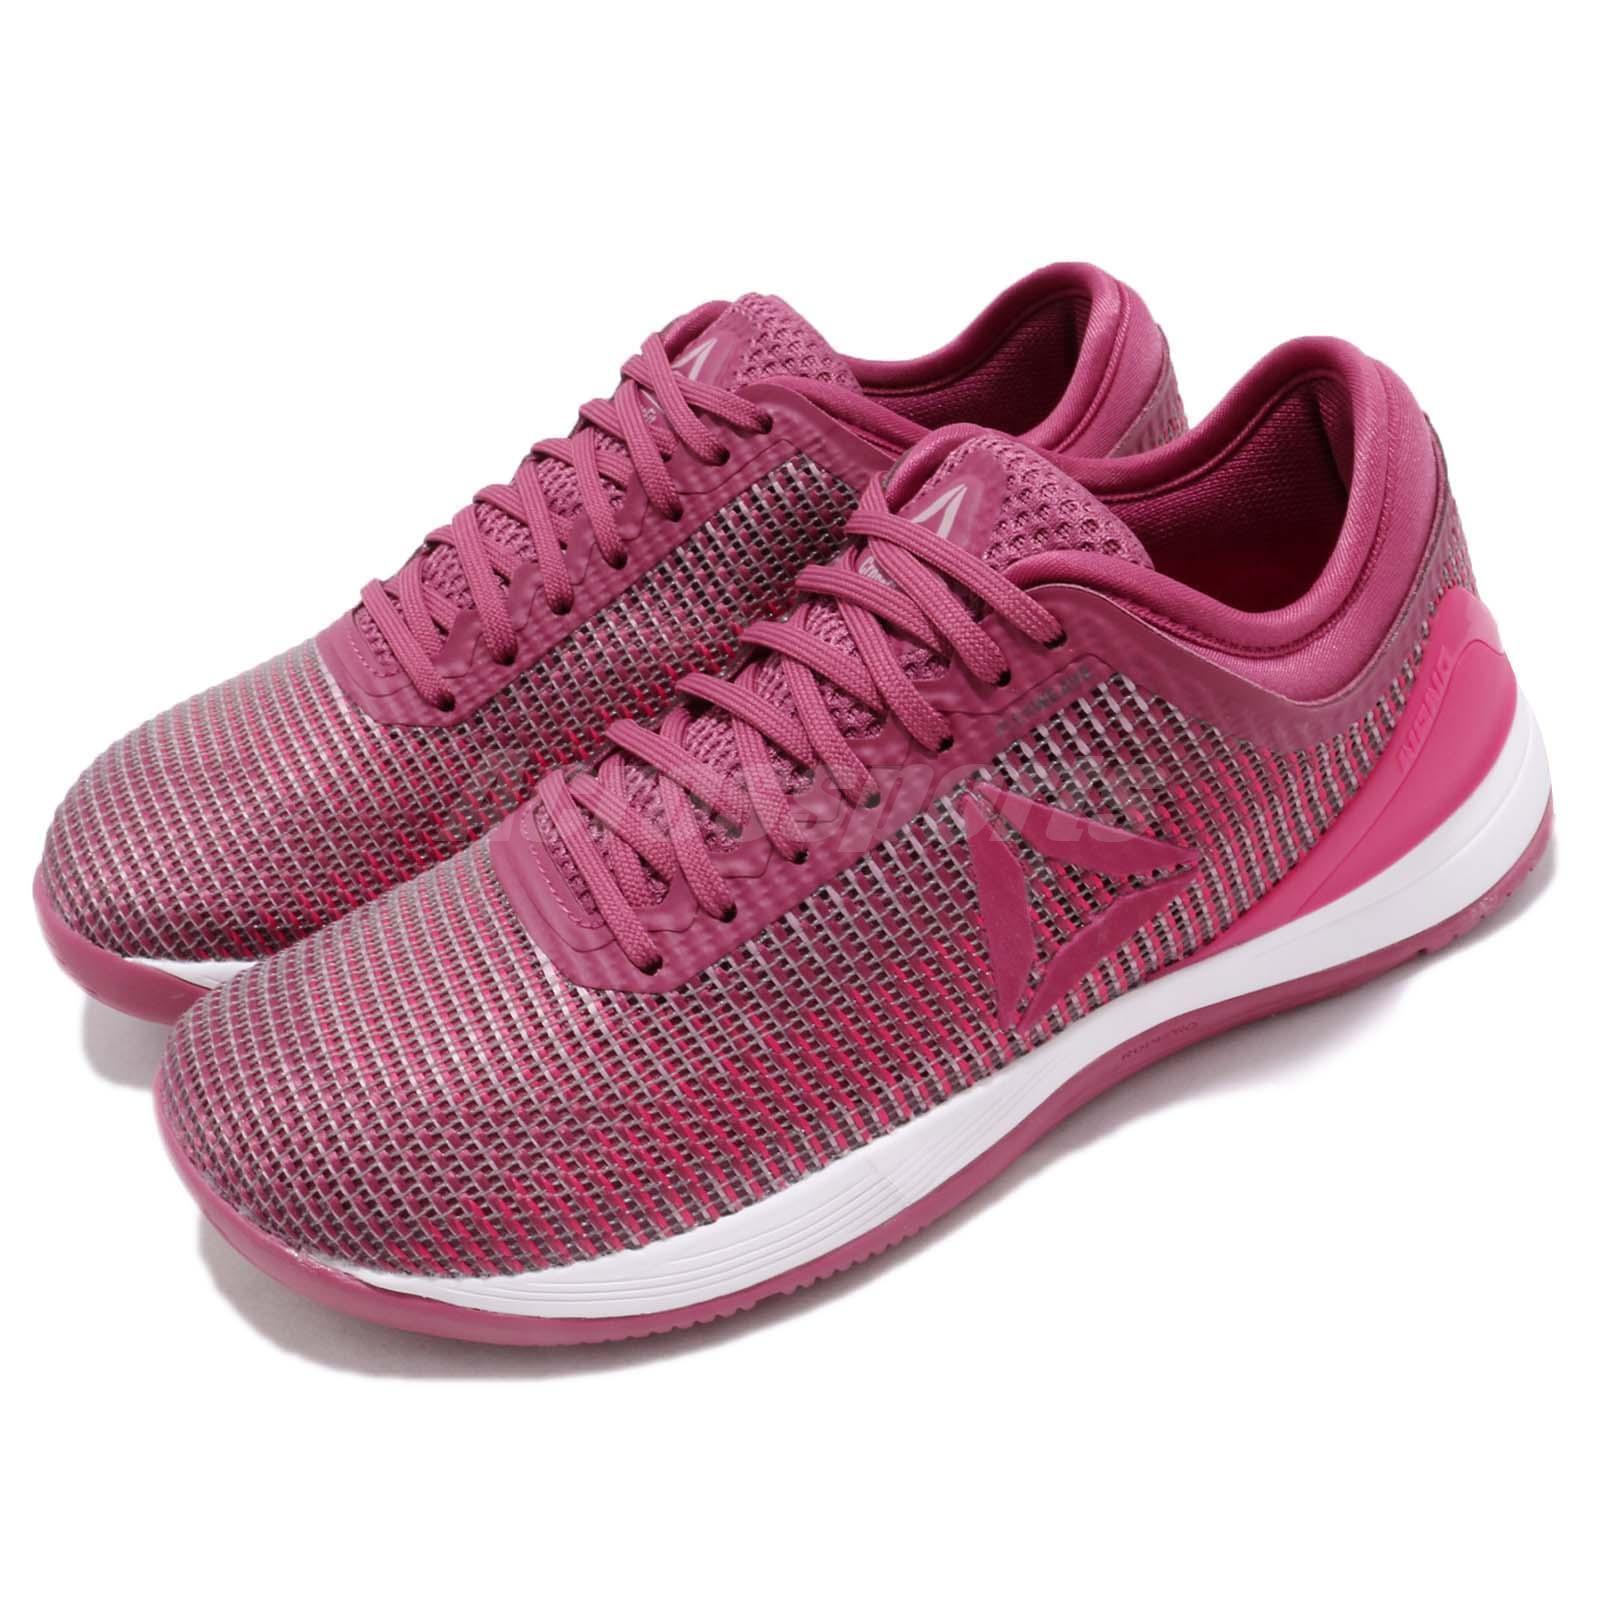 Reebok R CrossFit Nano  8.0 Berry Pink White purplec Women Training shoes CN2978  incredible discounts